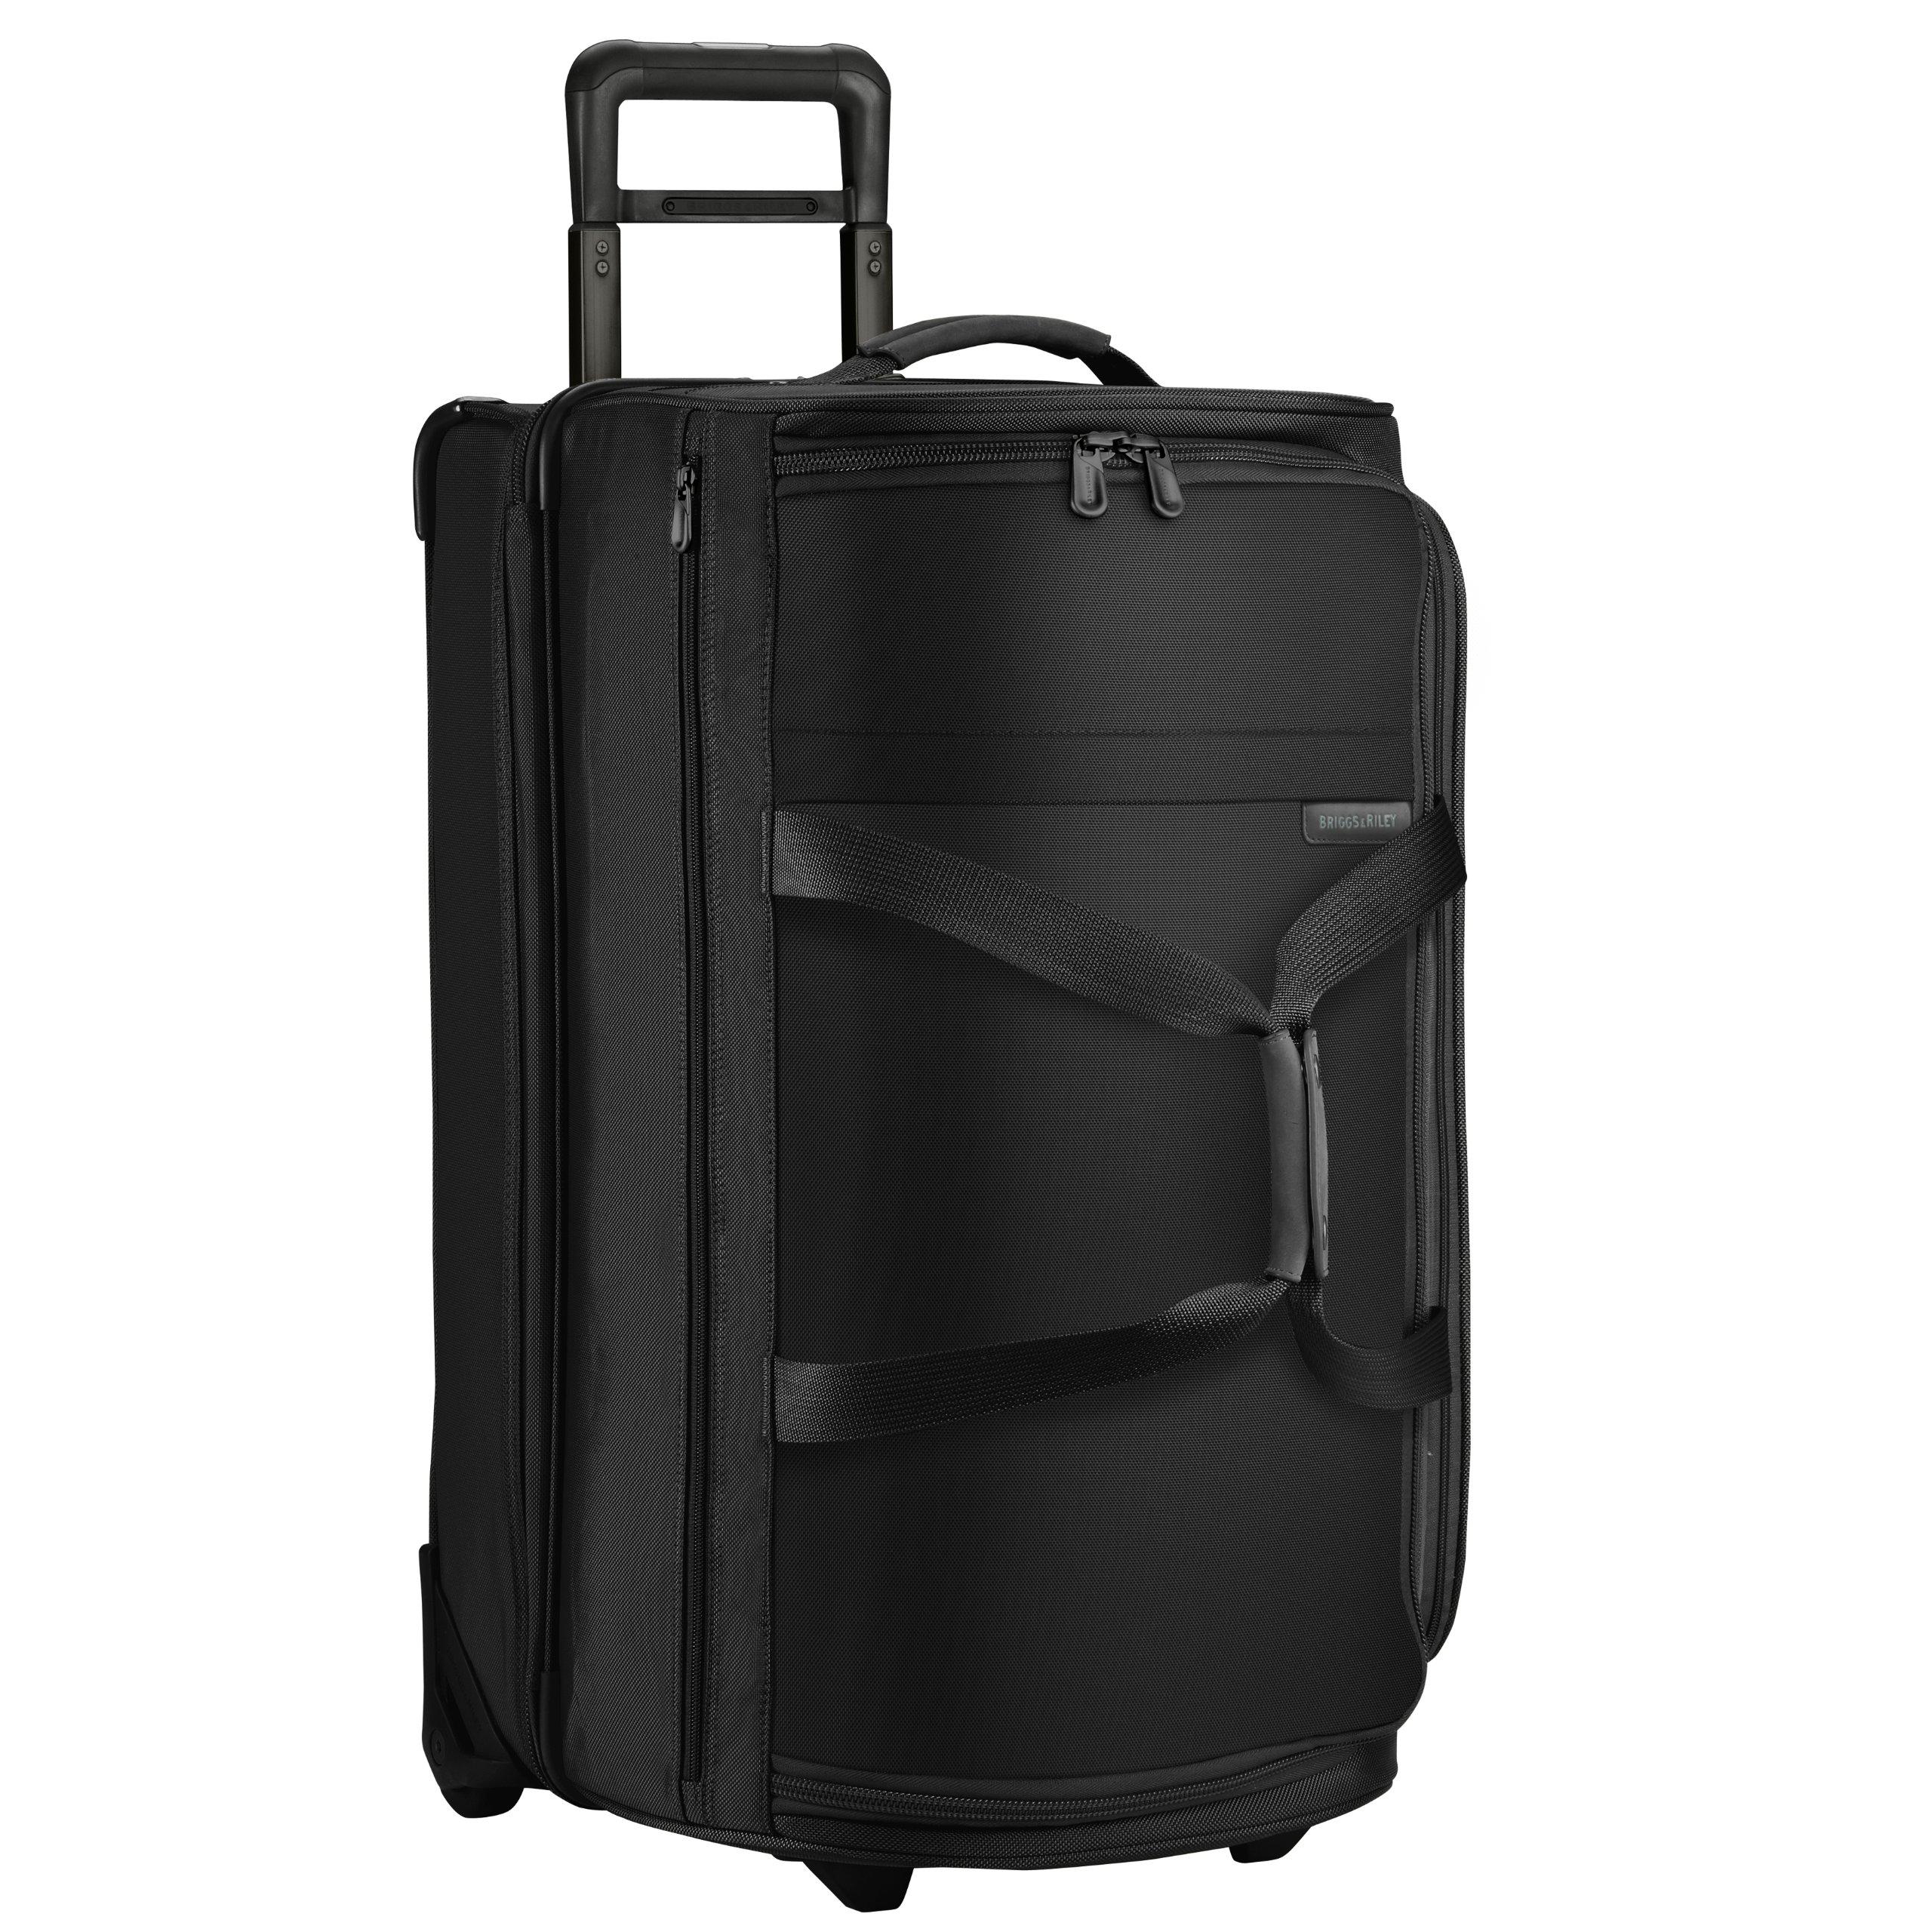 Briggs & Riley Baseline Upright Duffle Bag, Black, Medium